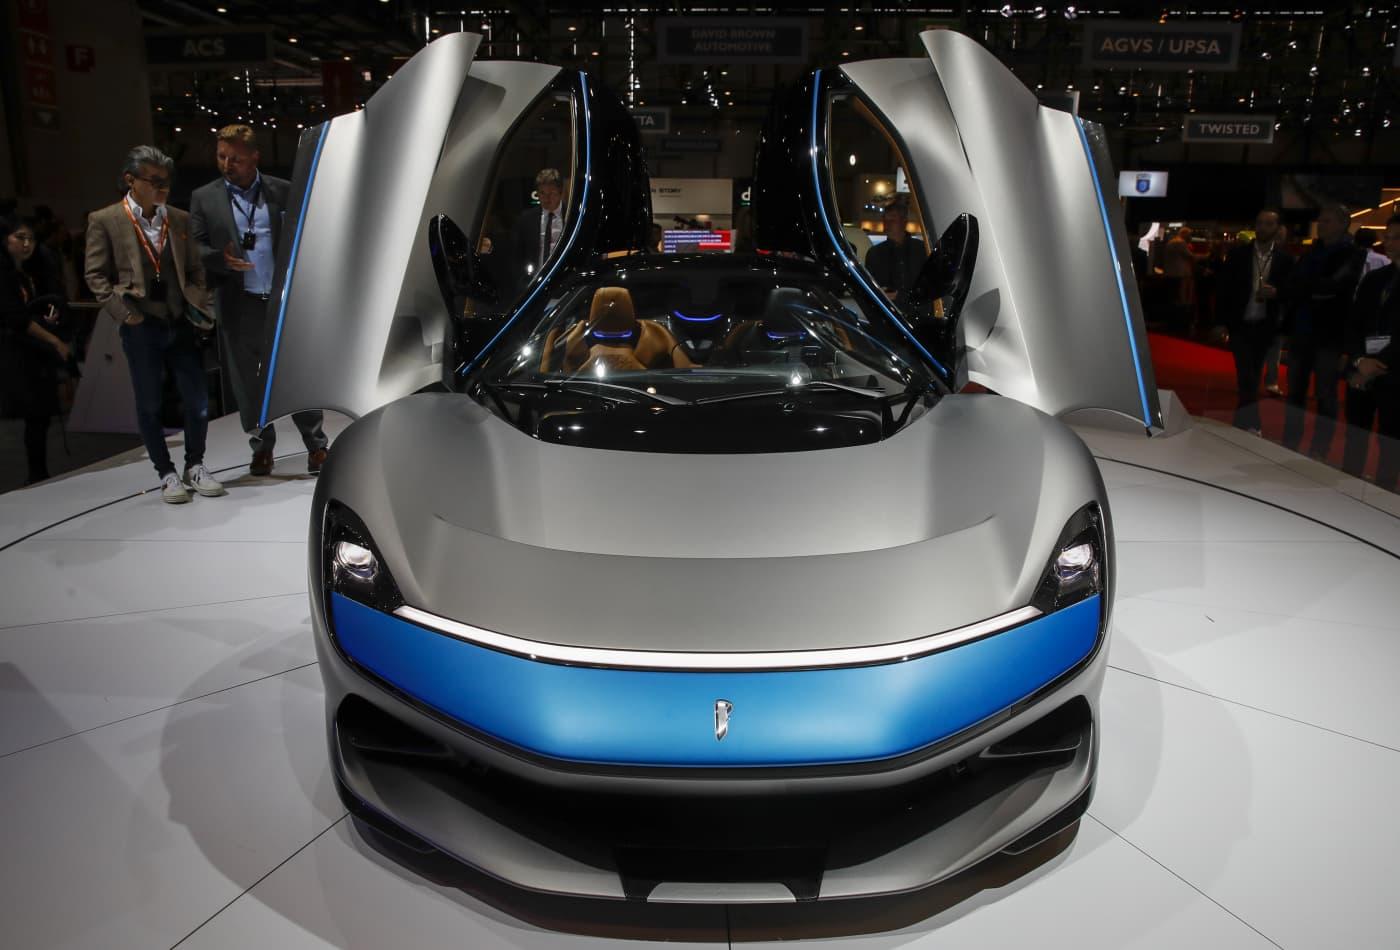 BMW, Porsche to debut new cars online after coronavirus outbreak cancels Geneva auto show